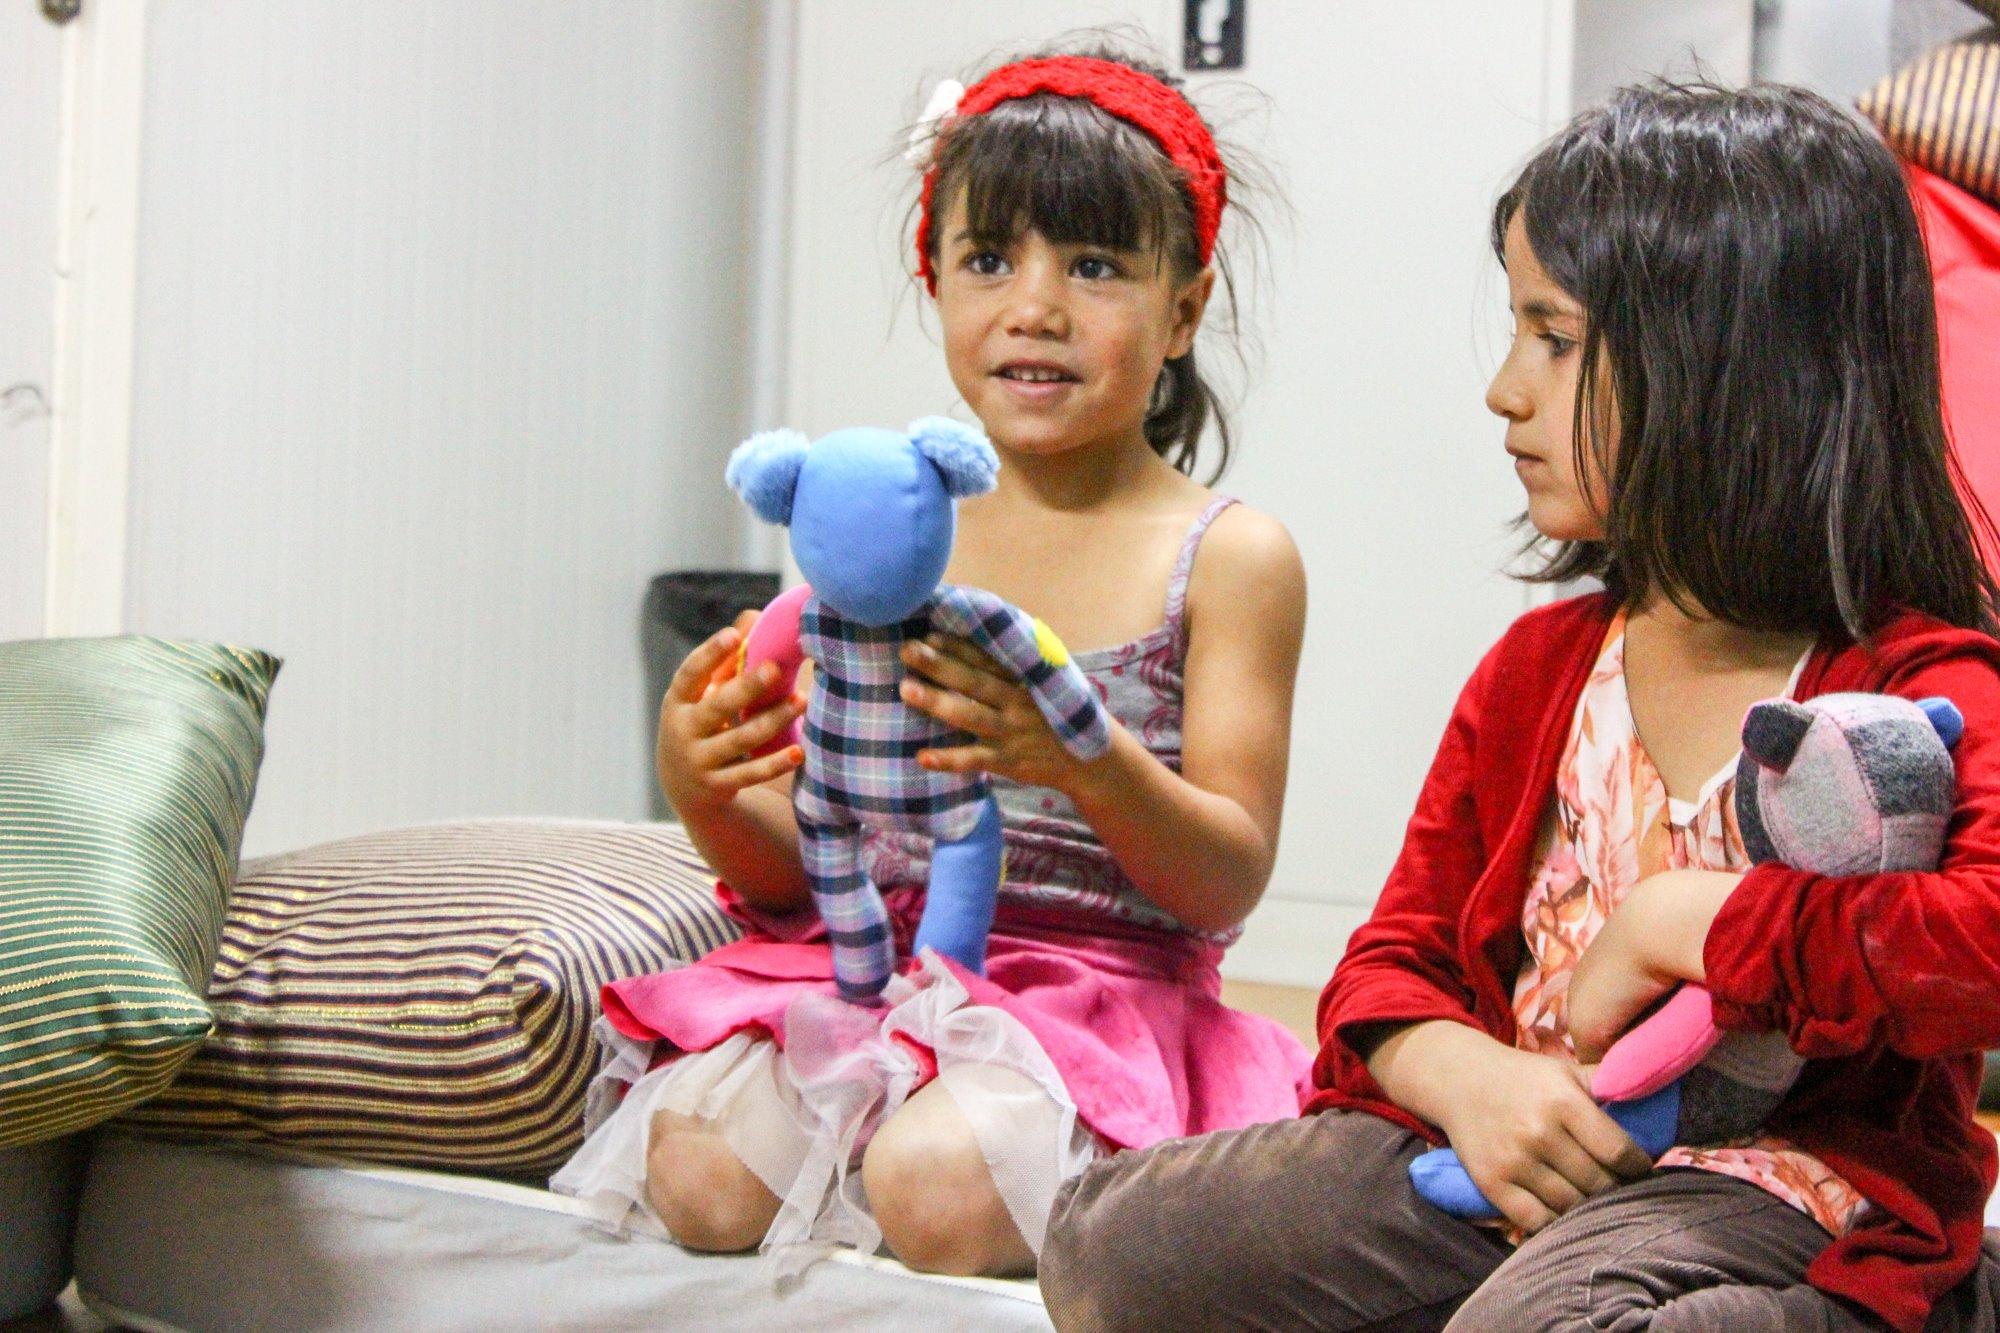 Refugee-Children-Jordan-Aug-2015-Copyright-Threadies-201511893913_1624801021126996_1251176040810366507_o.jpg